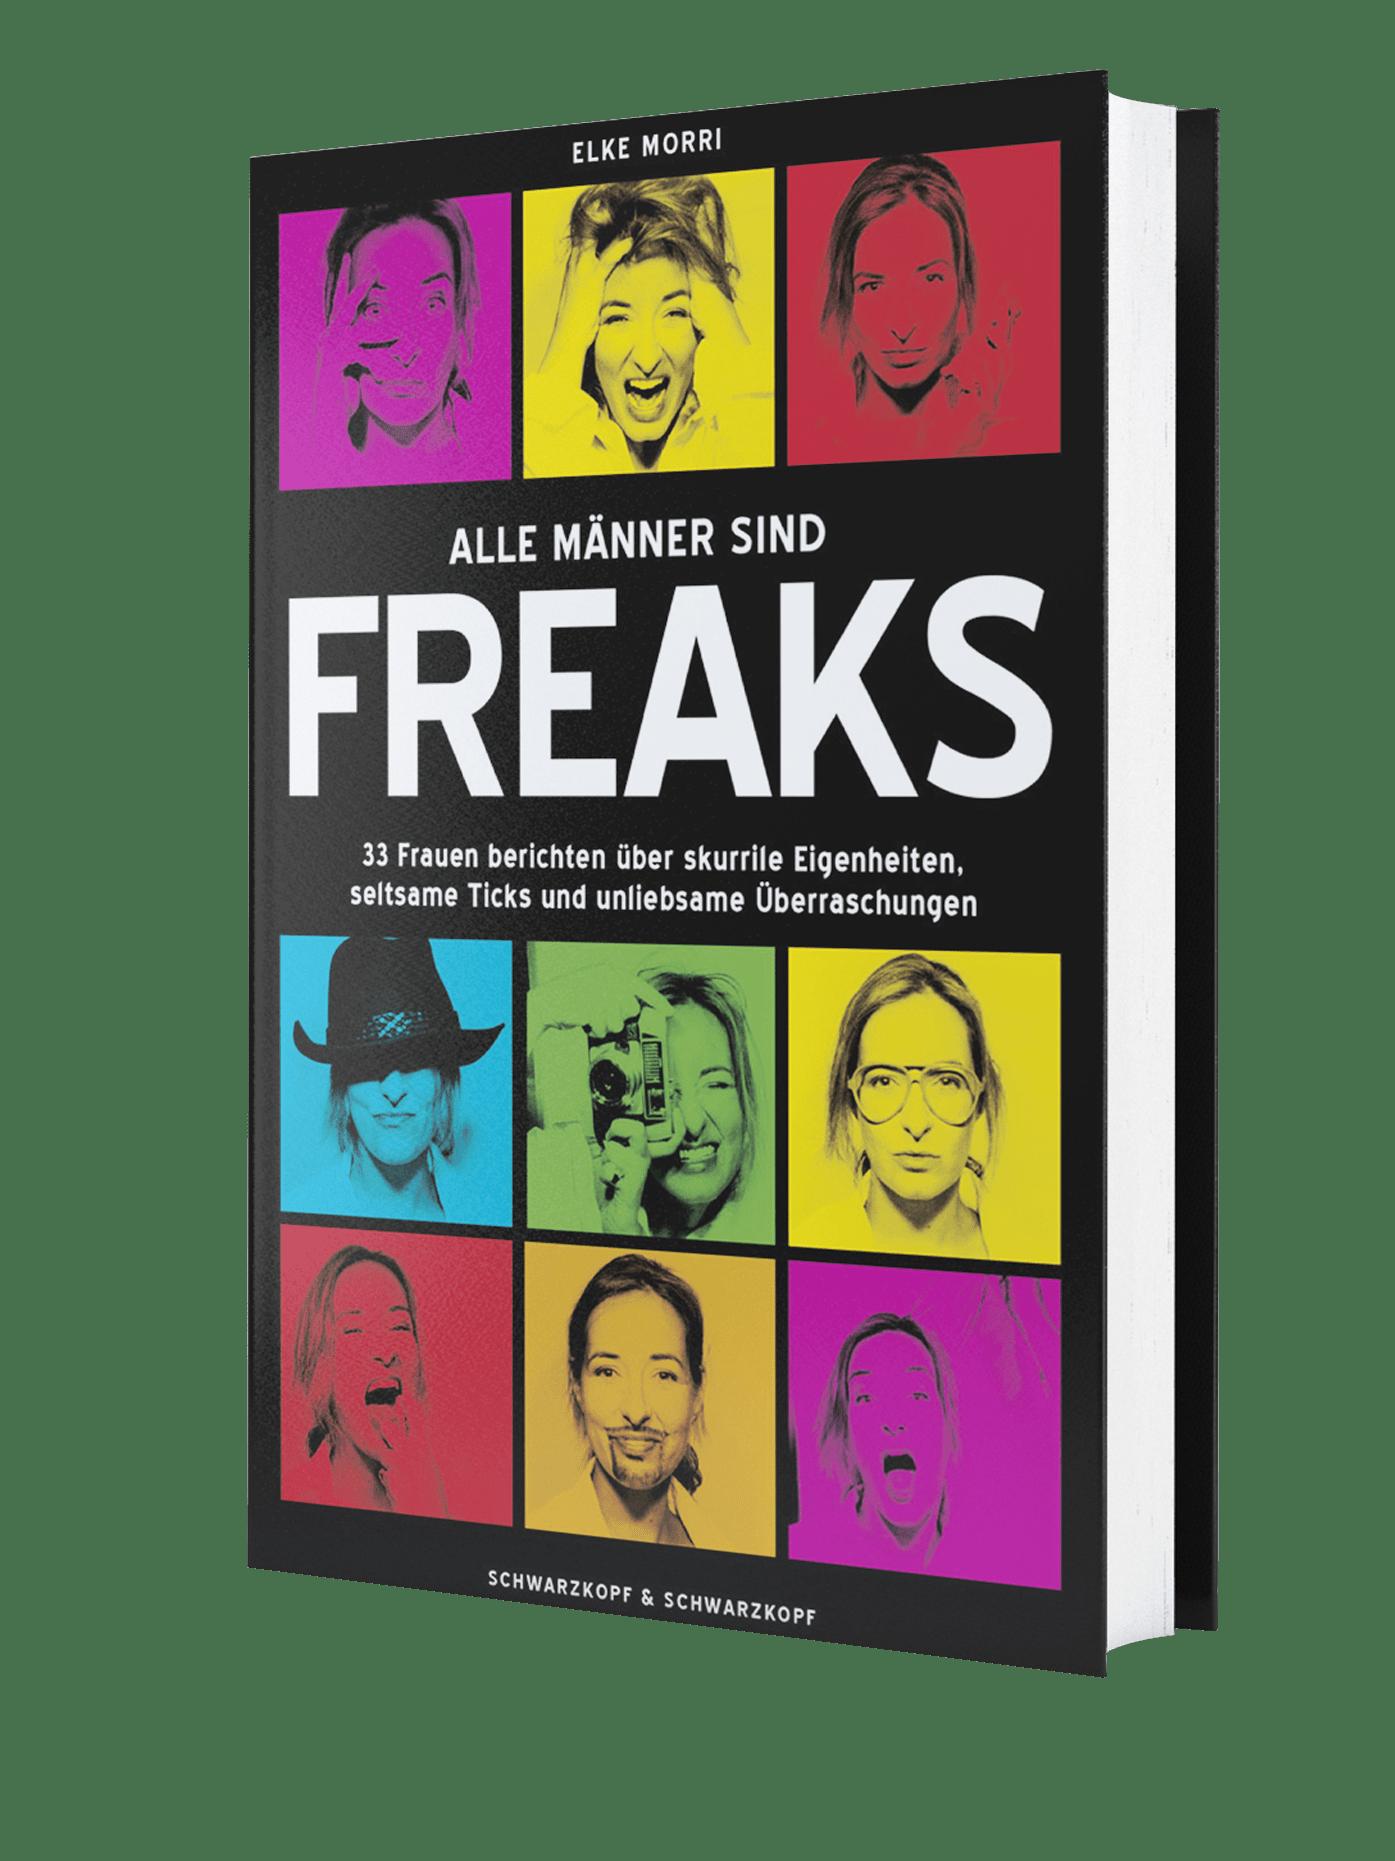 Alle Männer sind Freaks von Elke Morri